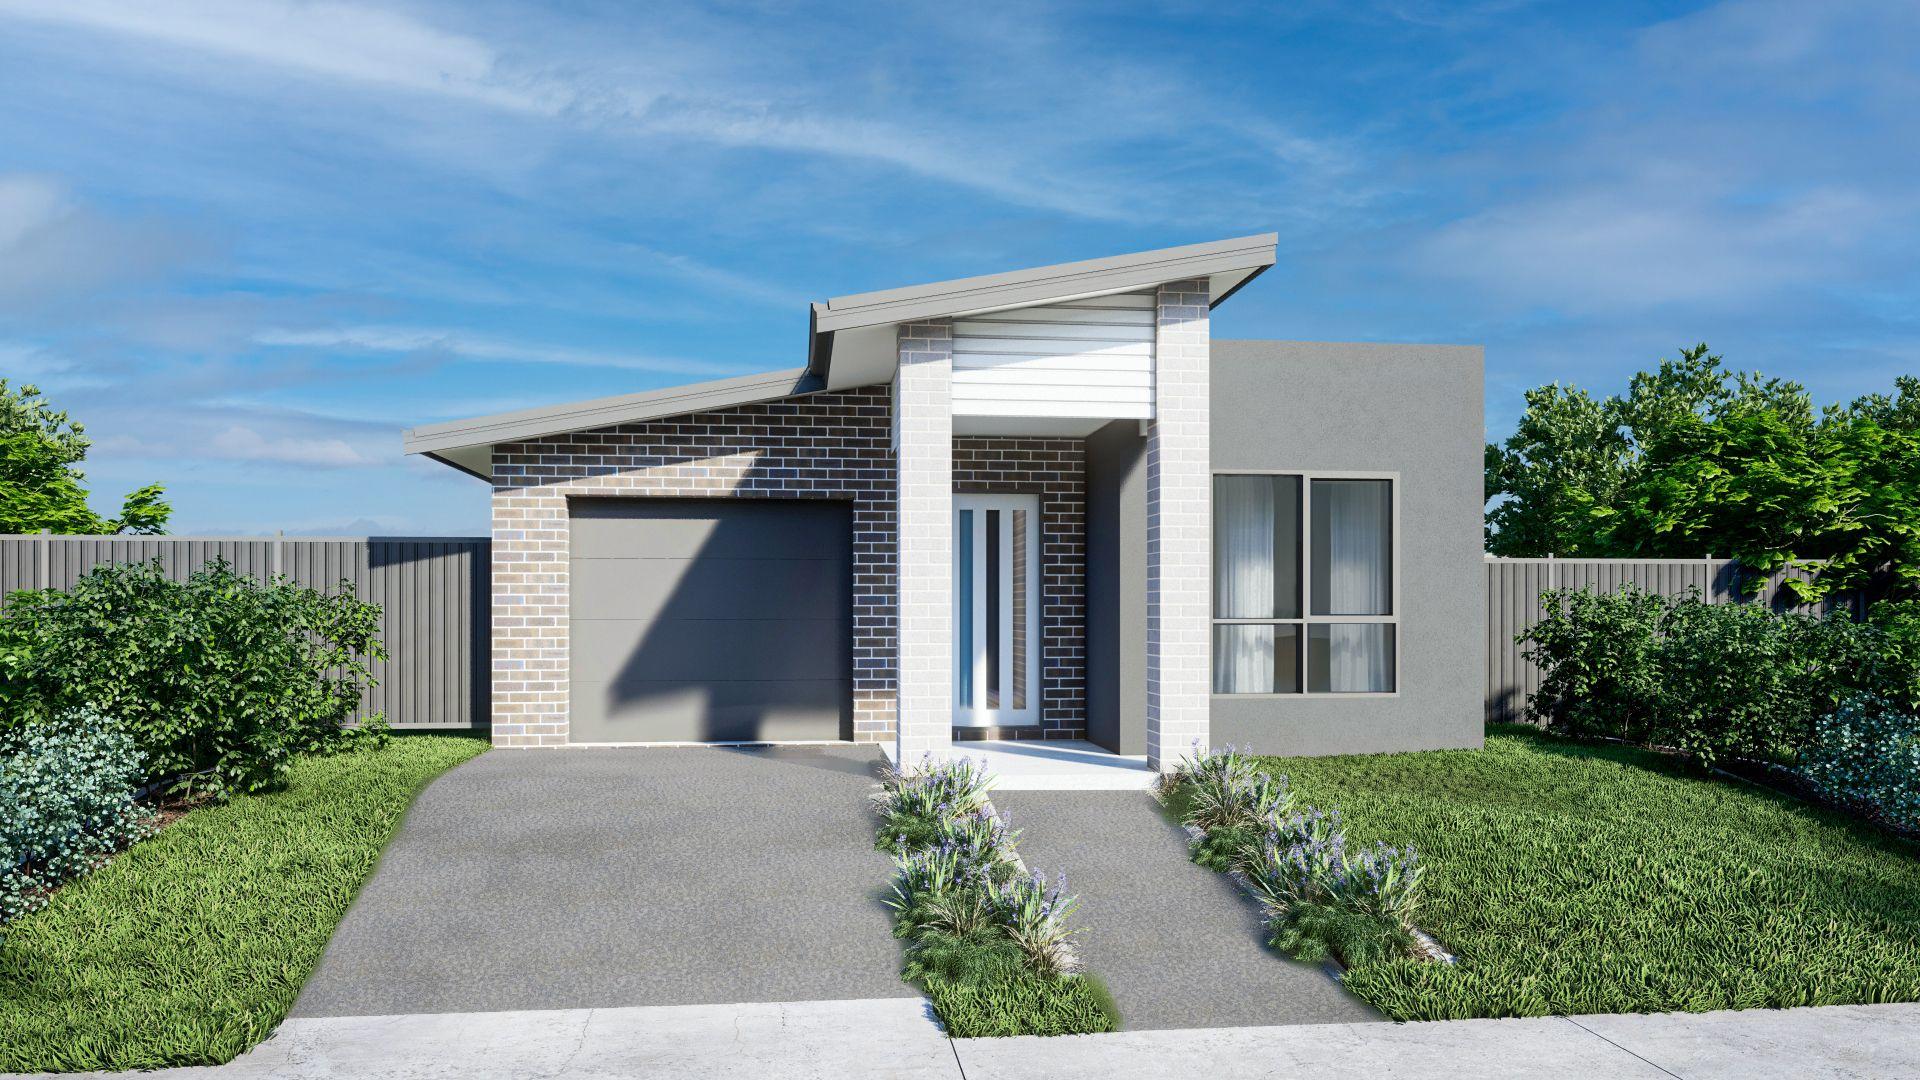 Lot 1-36 corner of bundeluk avenue and Driftway Drive, Pemulwuy NSW 2145, Image 0